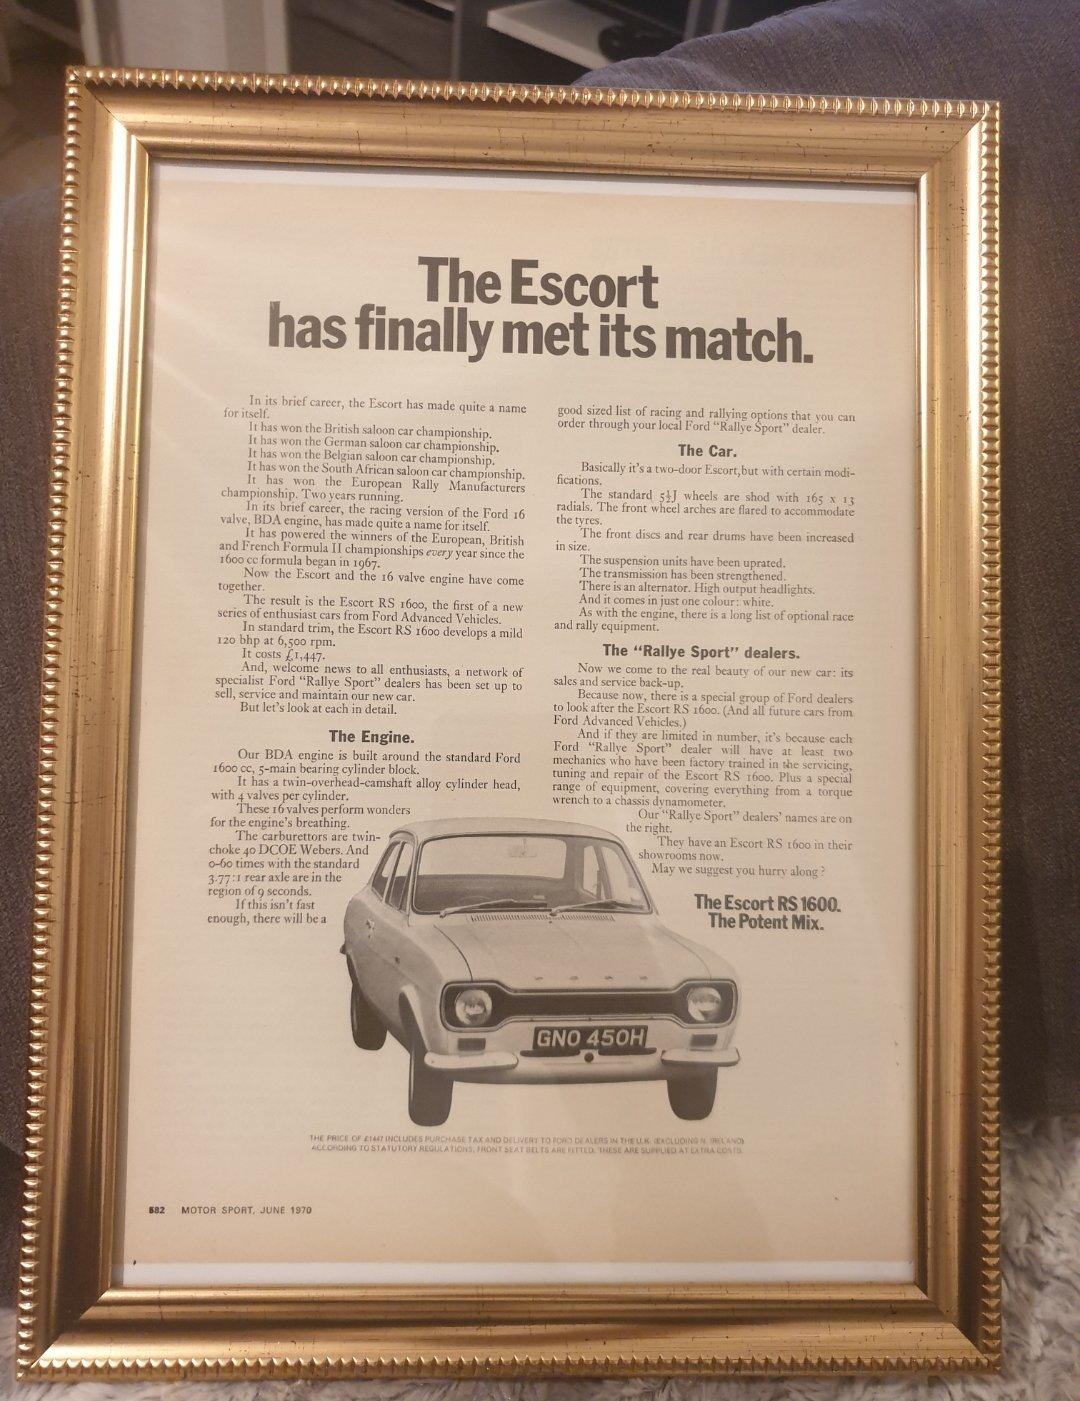 Original 1970 Escort RS1600 Framed Advert For Sale (picture 1 of 2)